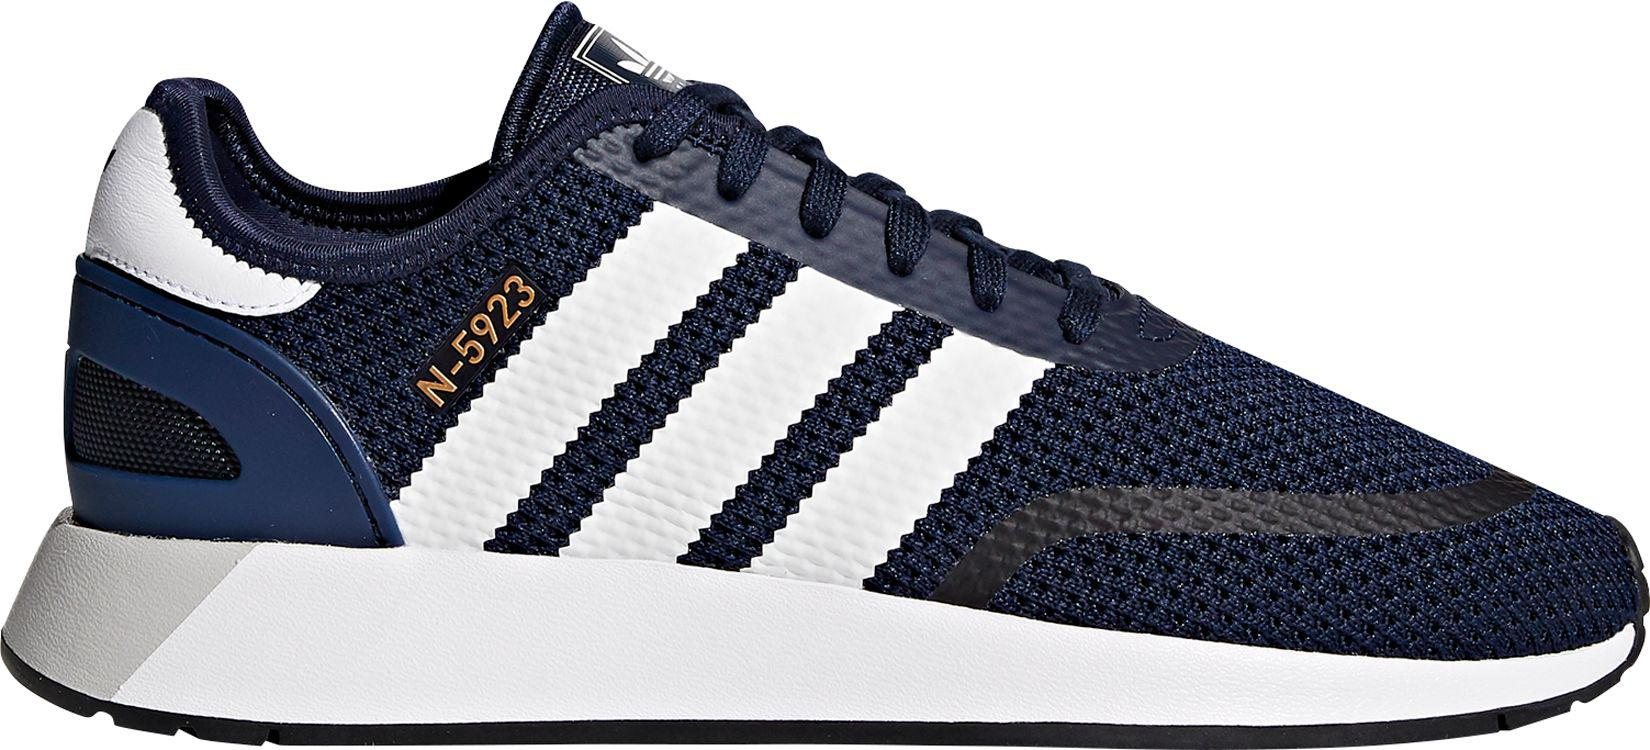 adidas N 5923 shoes blue